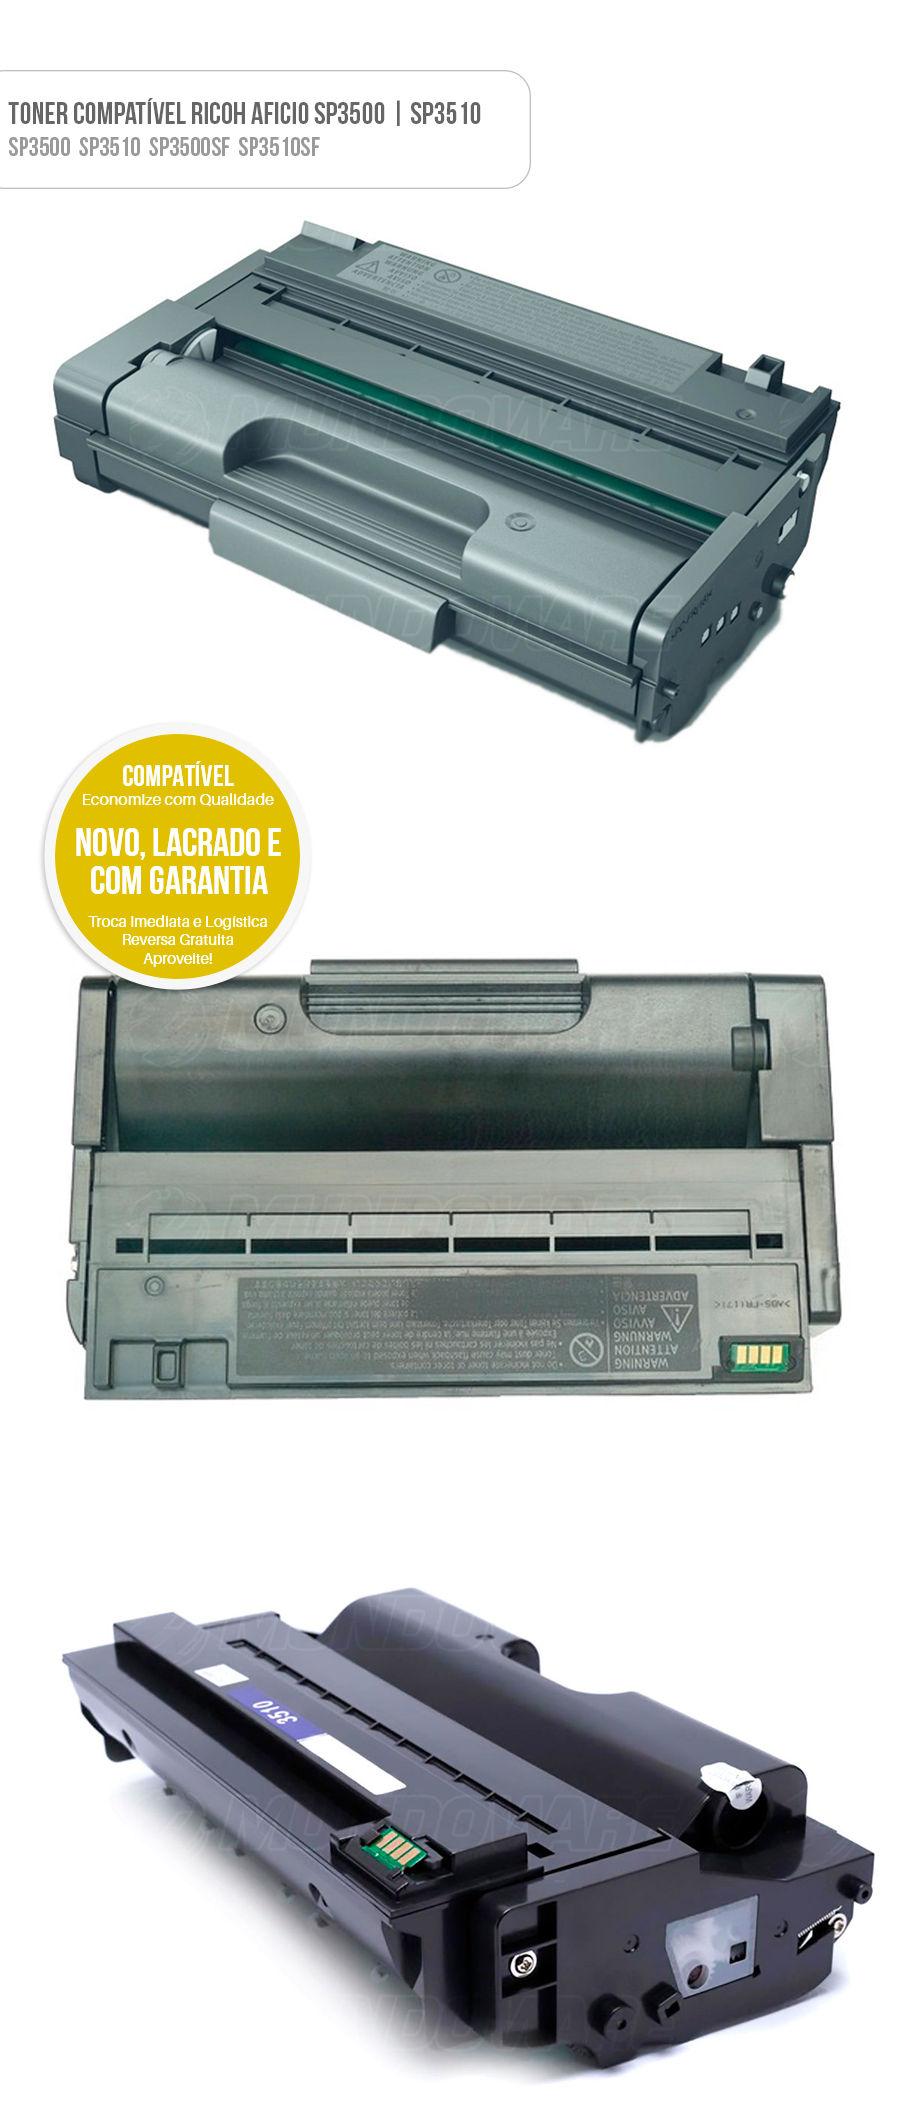 Ricoh Aficio Toner SP3500 406989 SP3510 SP3410 SP-3500 406989 SP-3510 SP-3410 Tonner